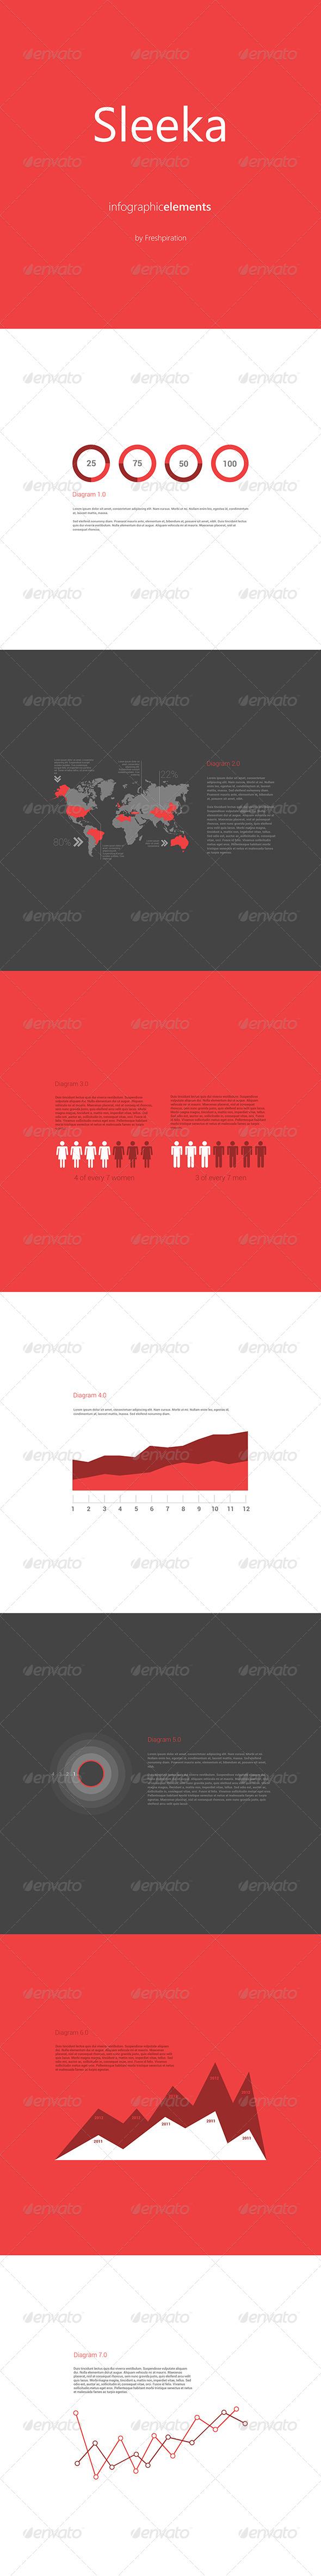 GraphicRiver Sleeka Infographic Elements 4172829